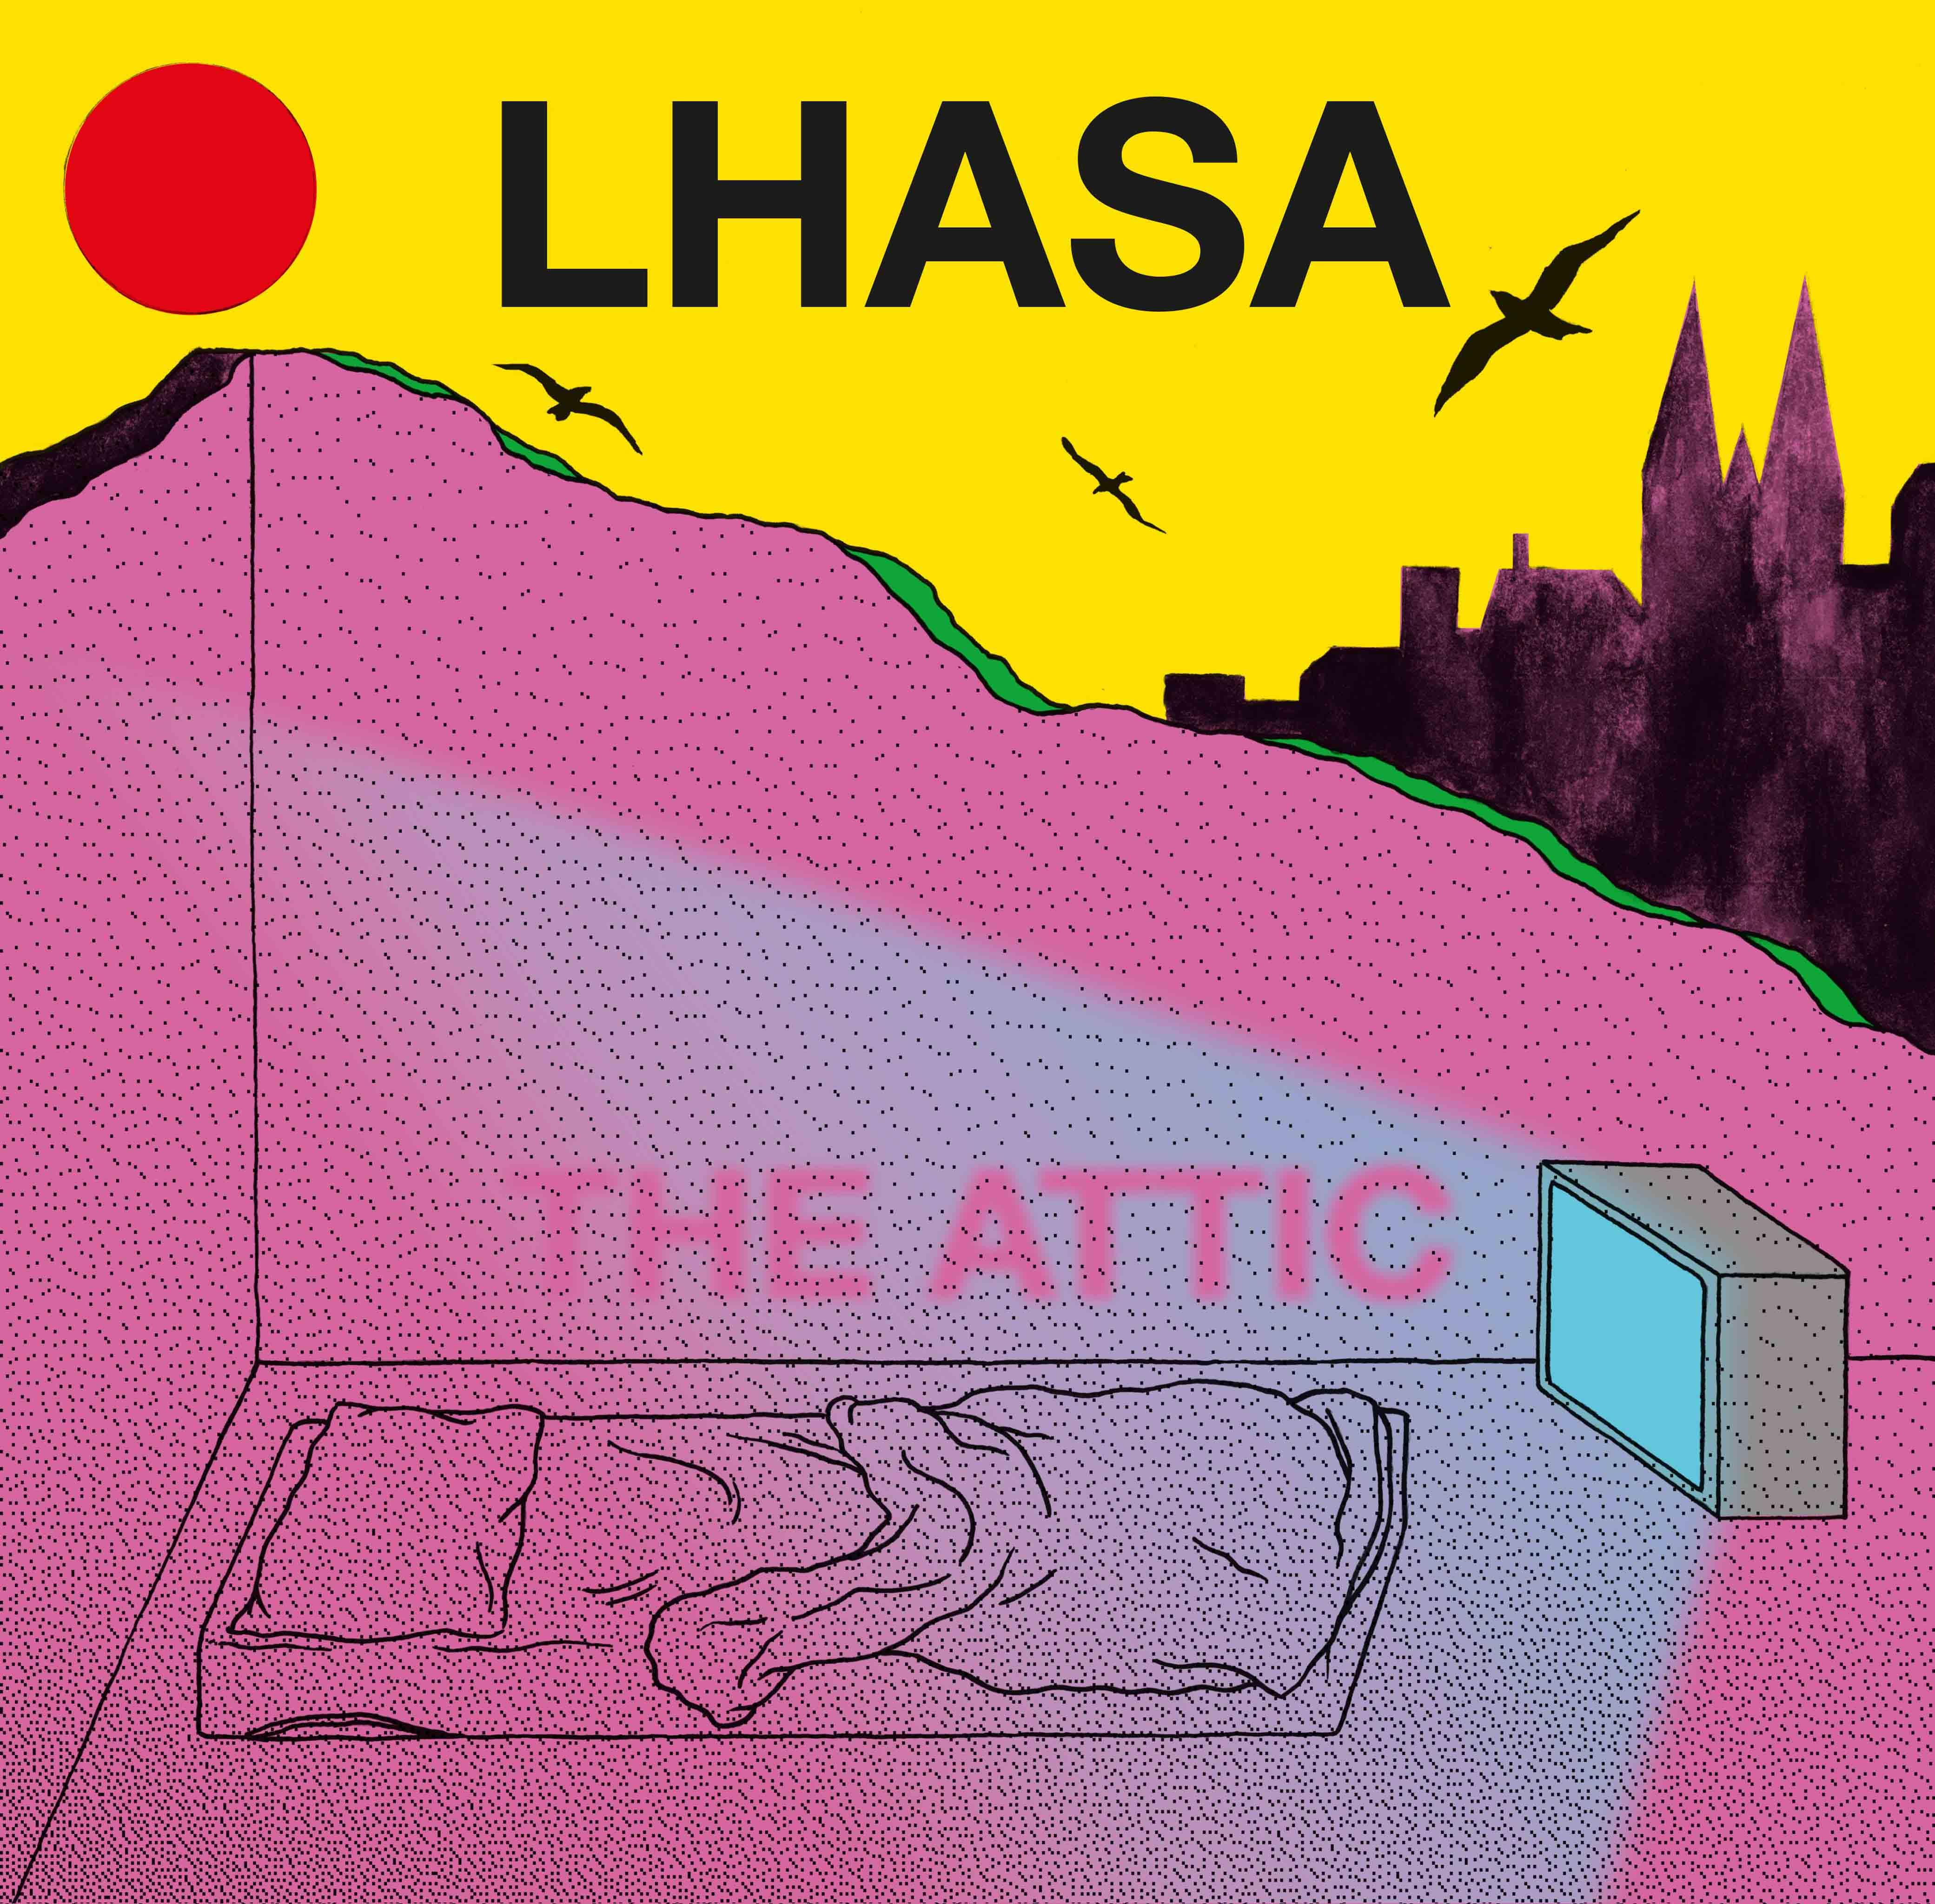 THE ATTIC / SEXXOR — LHASA